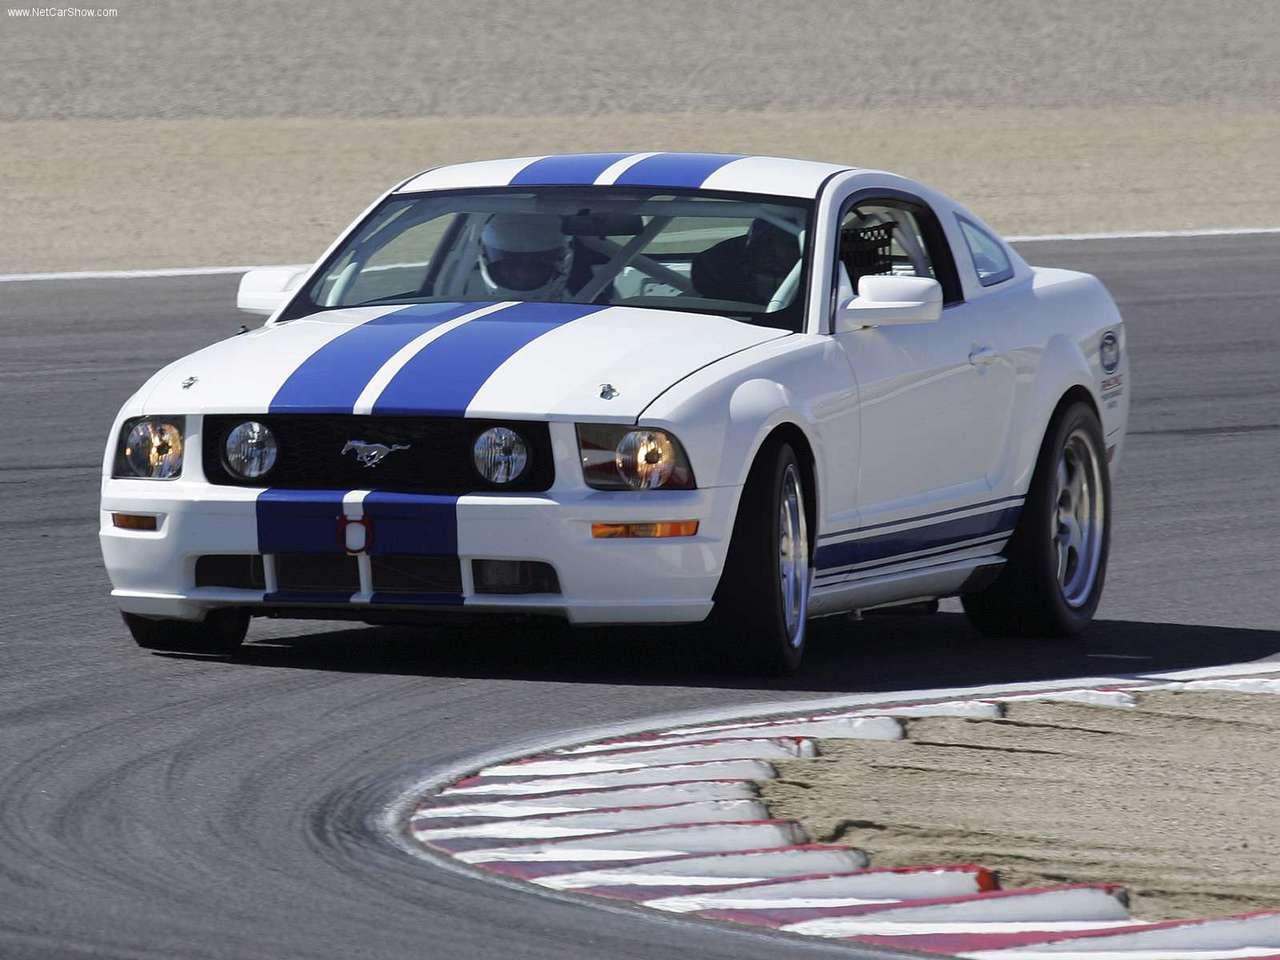 http://3.bp.blogspot.com/-k8pdaD7QEn8/TY0GDBdbLNI/AAAAAAAAGto/HceaV7sZxOk/s1600/Ford-Mustang_Racecar_Prototype_2005_1280x960_wallpaper_02.jpg